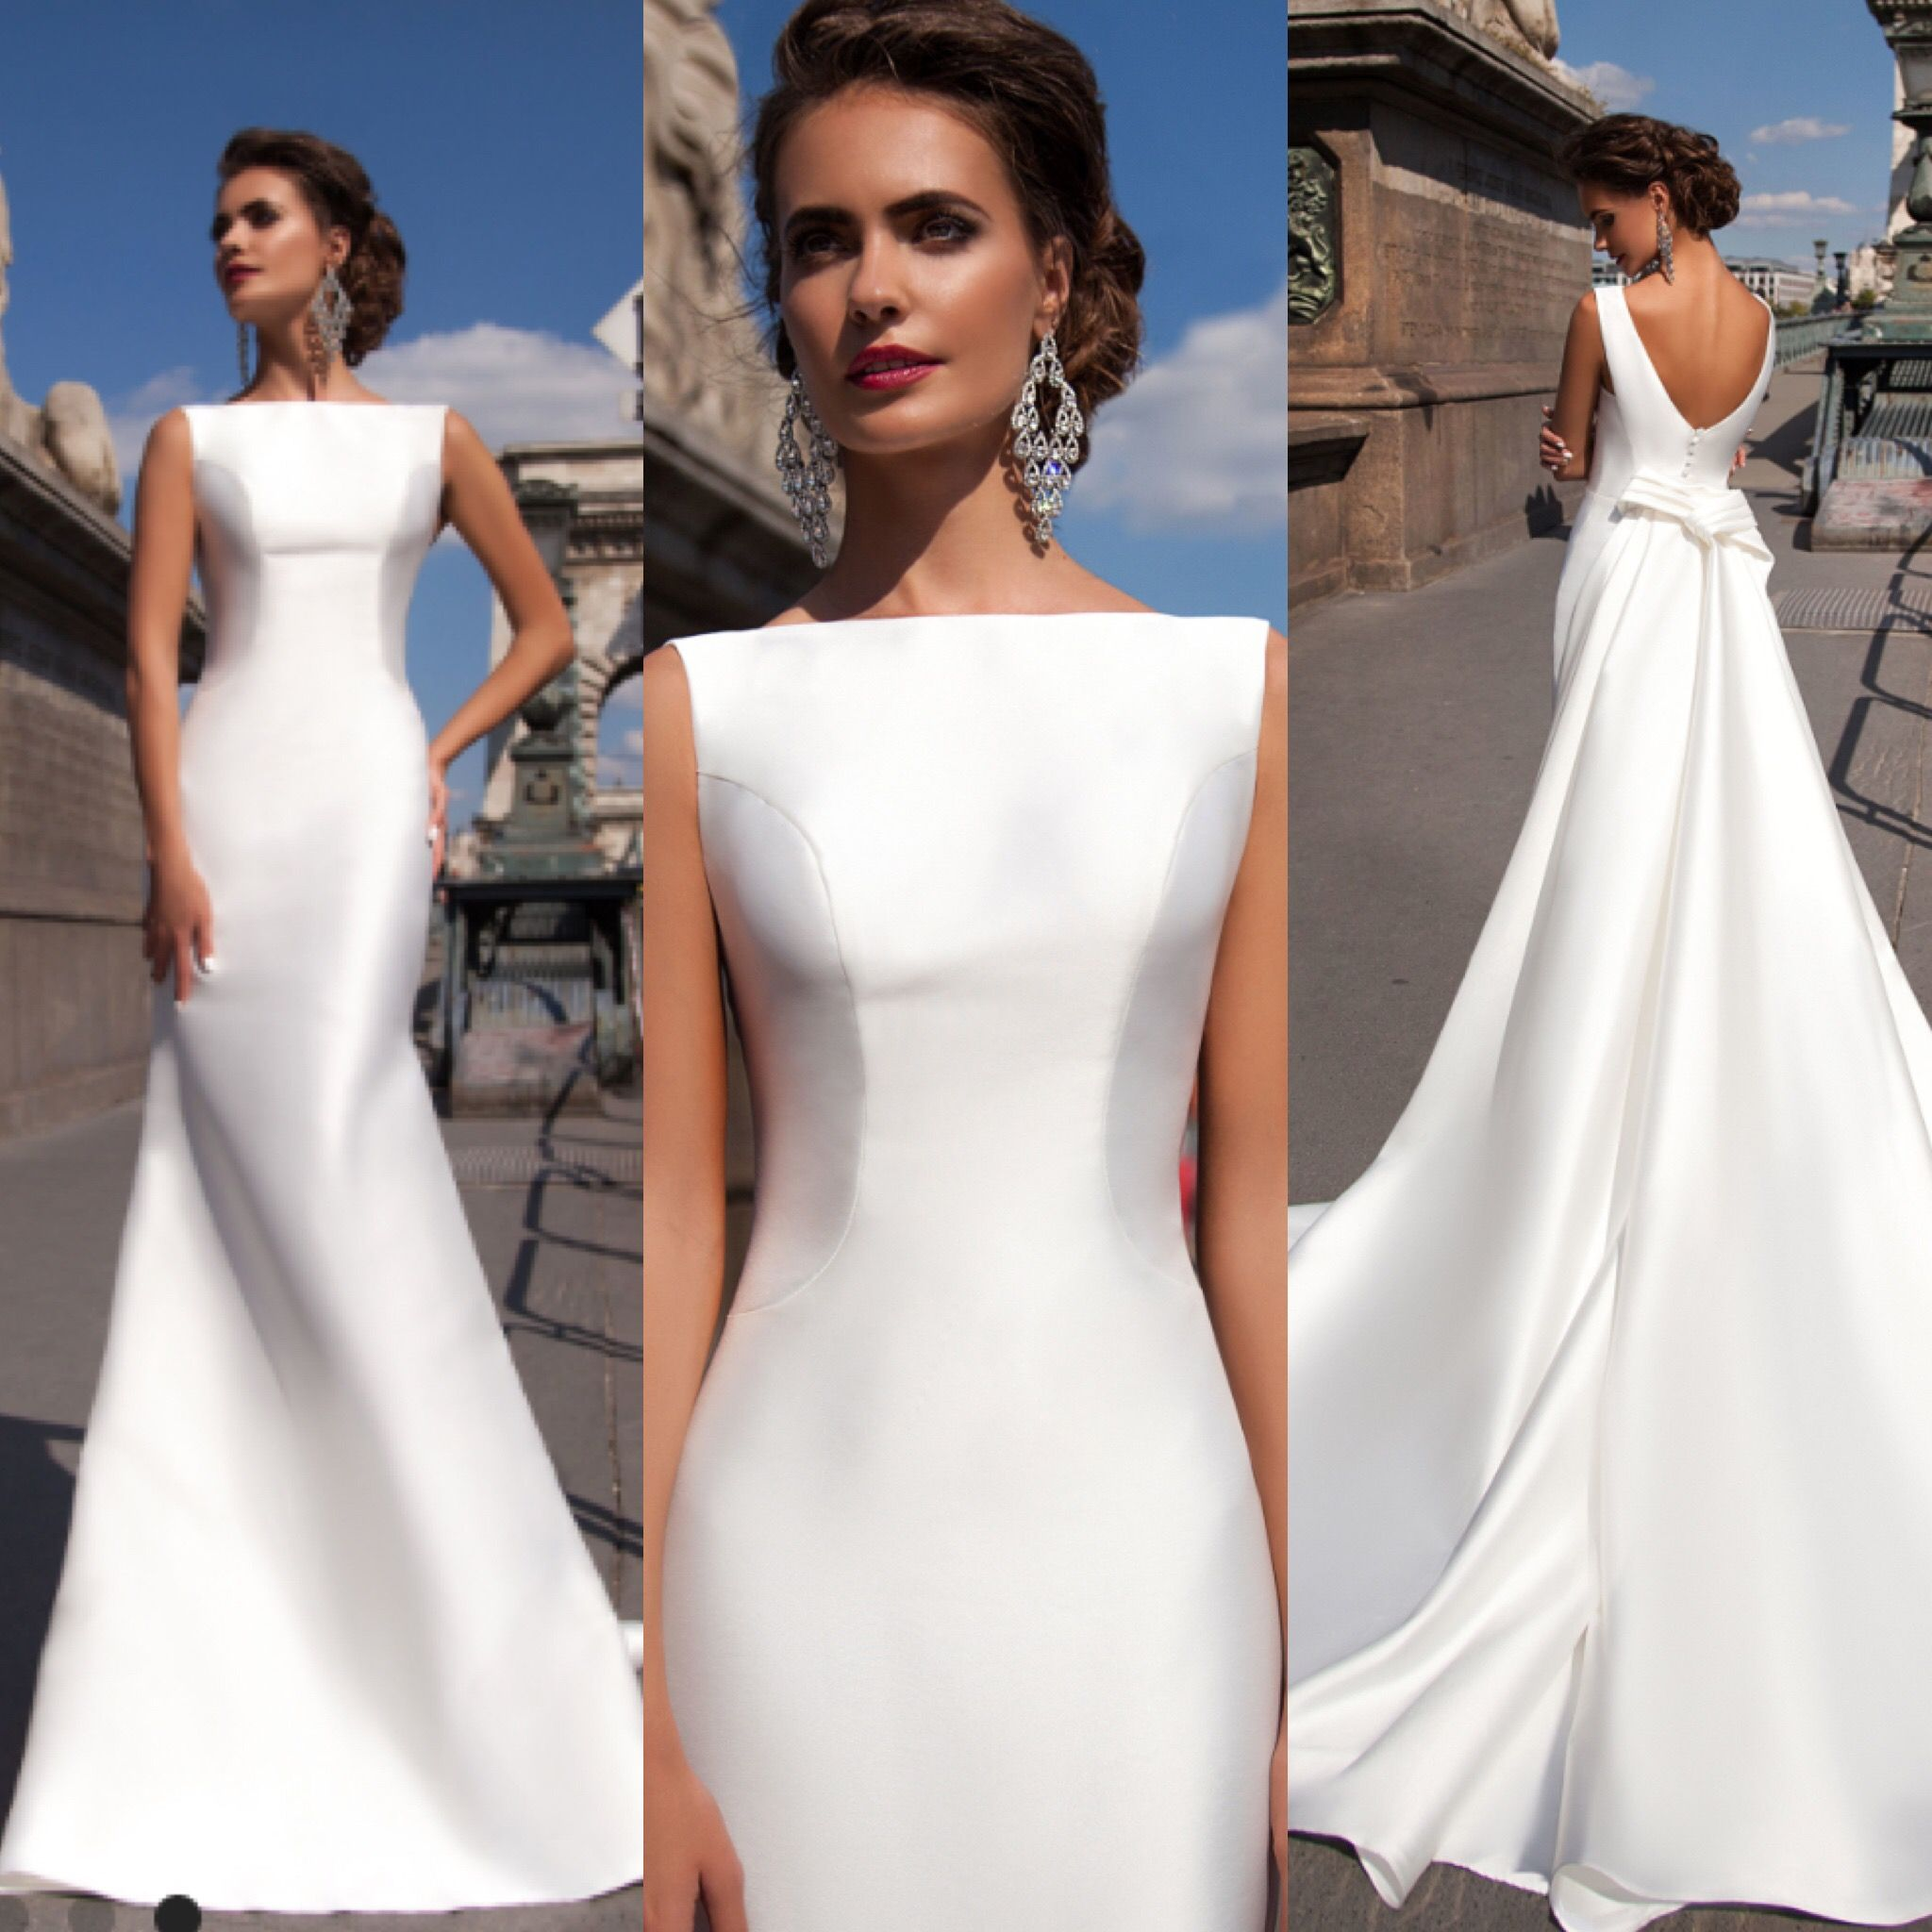 Wedding Gowns Chicago: Milla Nova • Lia 2016 • Delicate Pearl Collection $2150.00